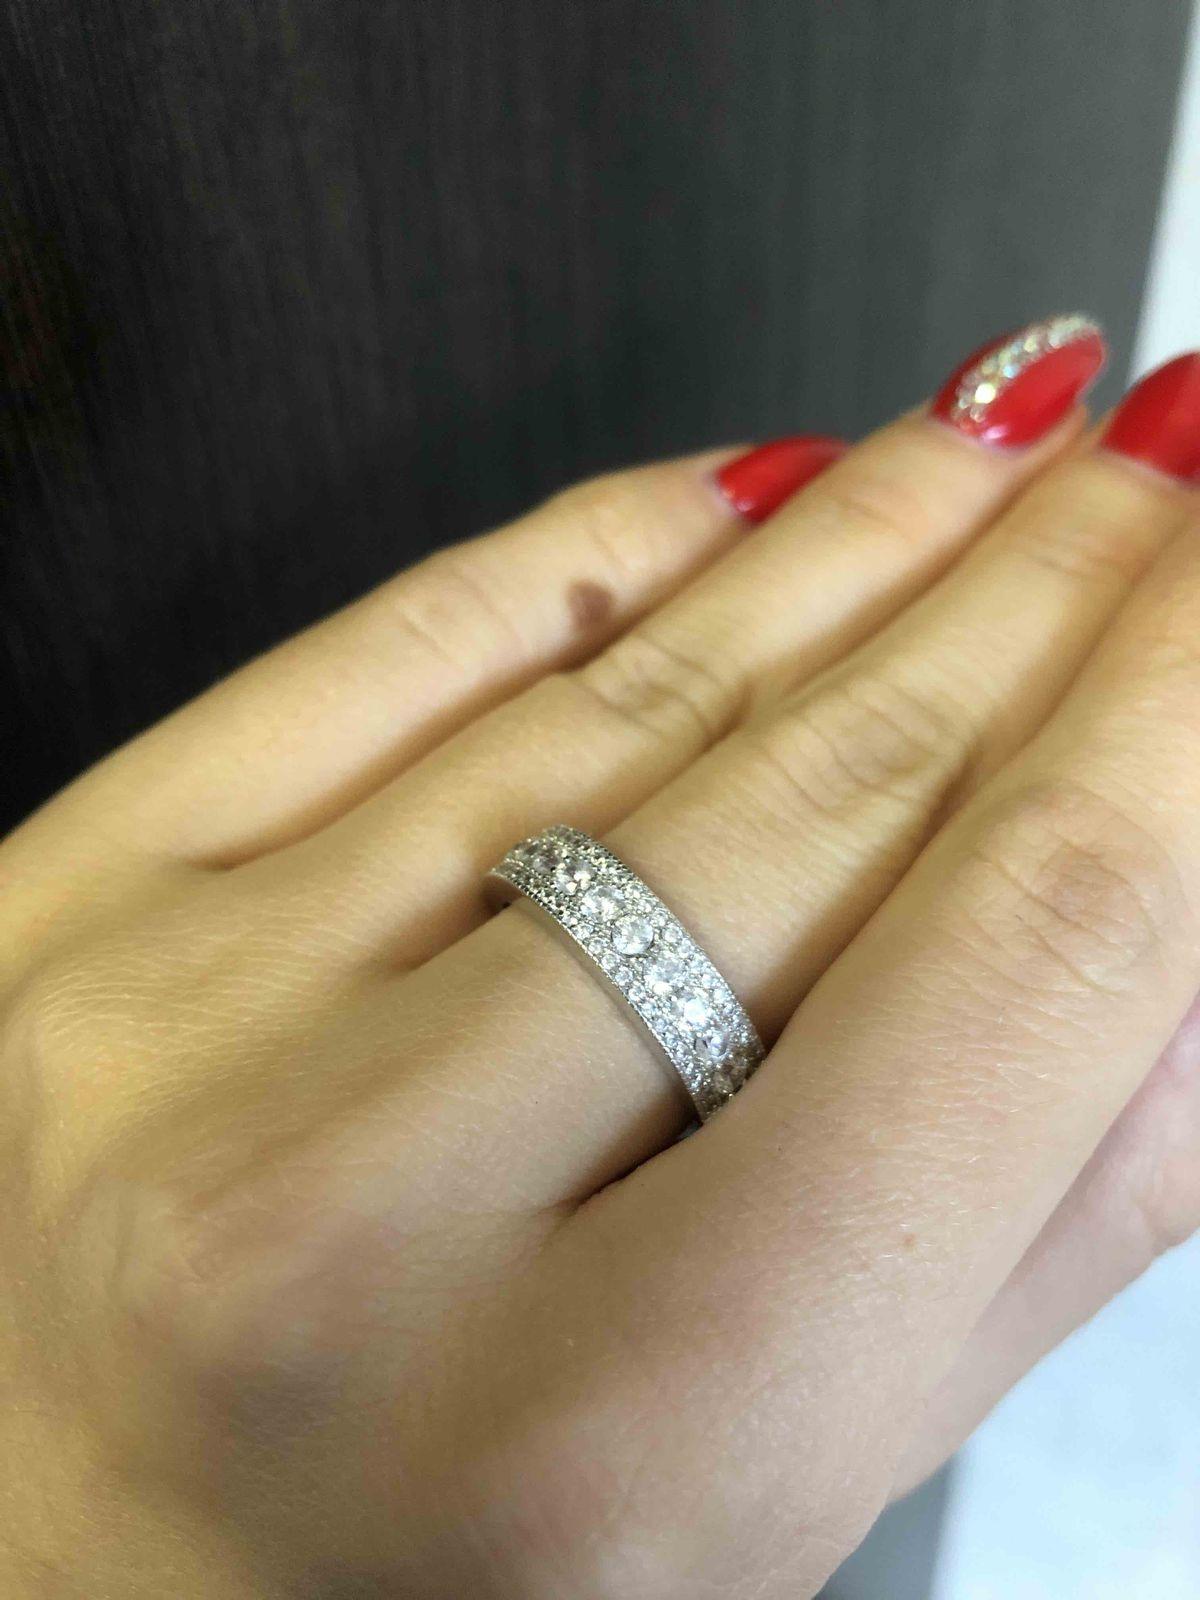 Красивое кольцо, с красивыми яркими камнями